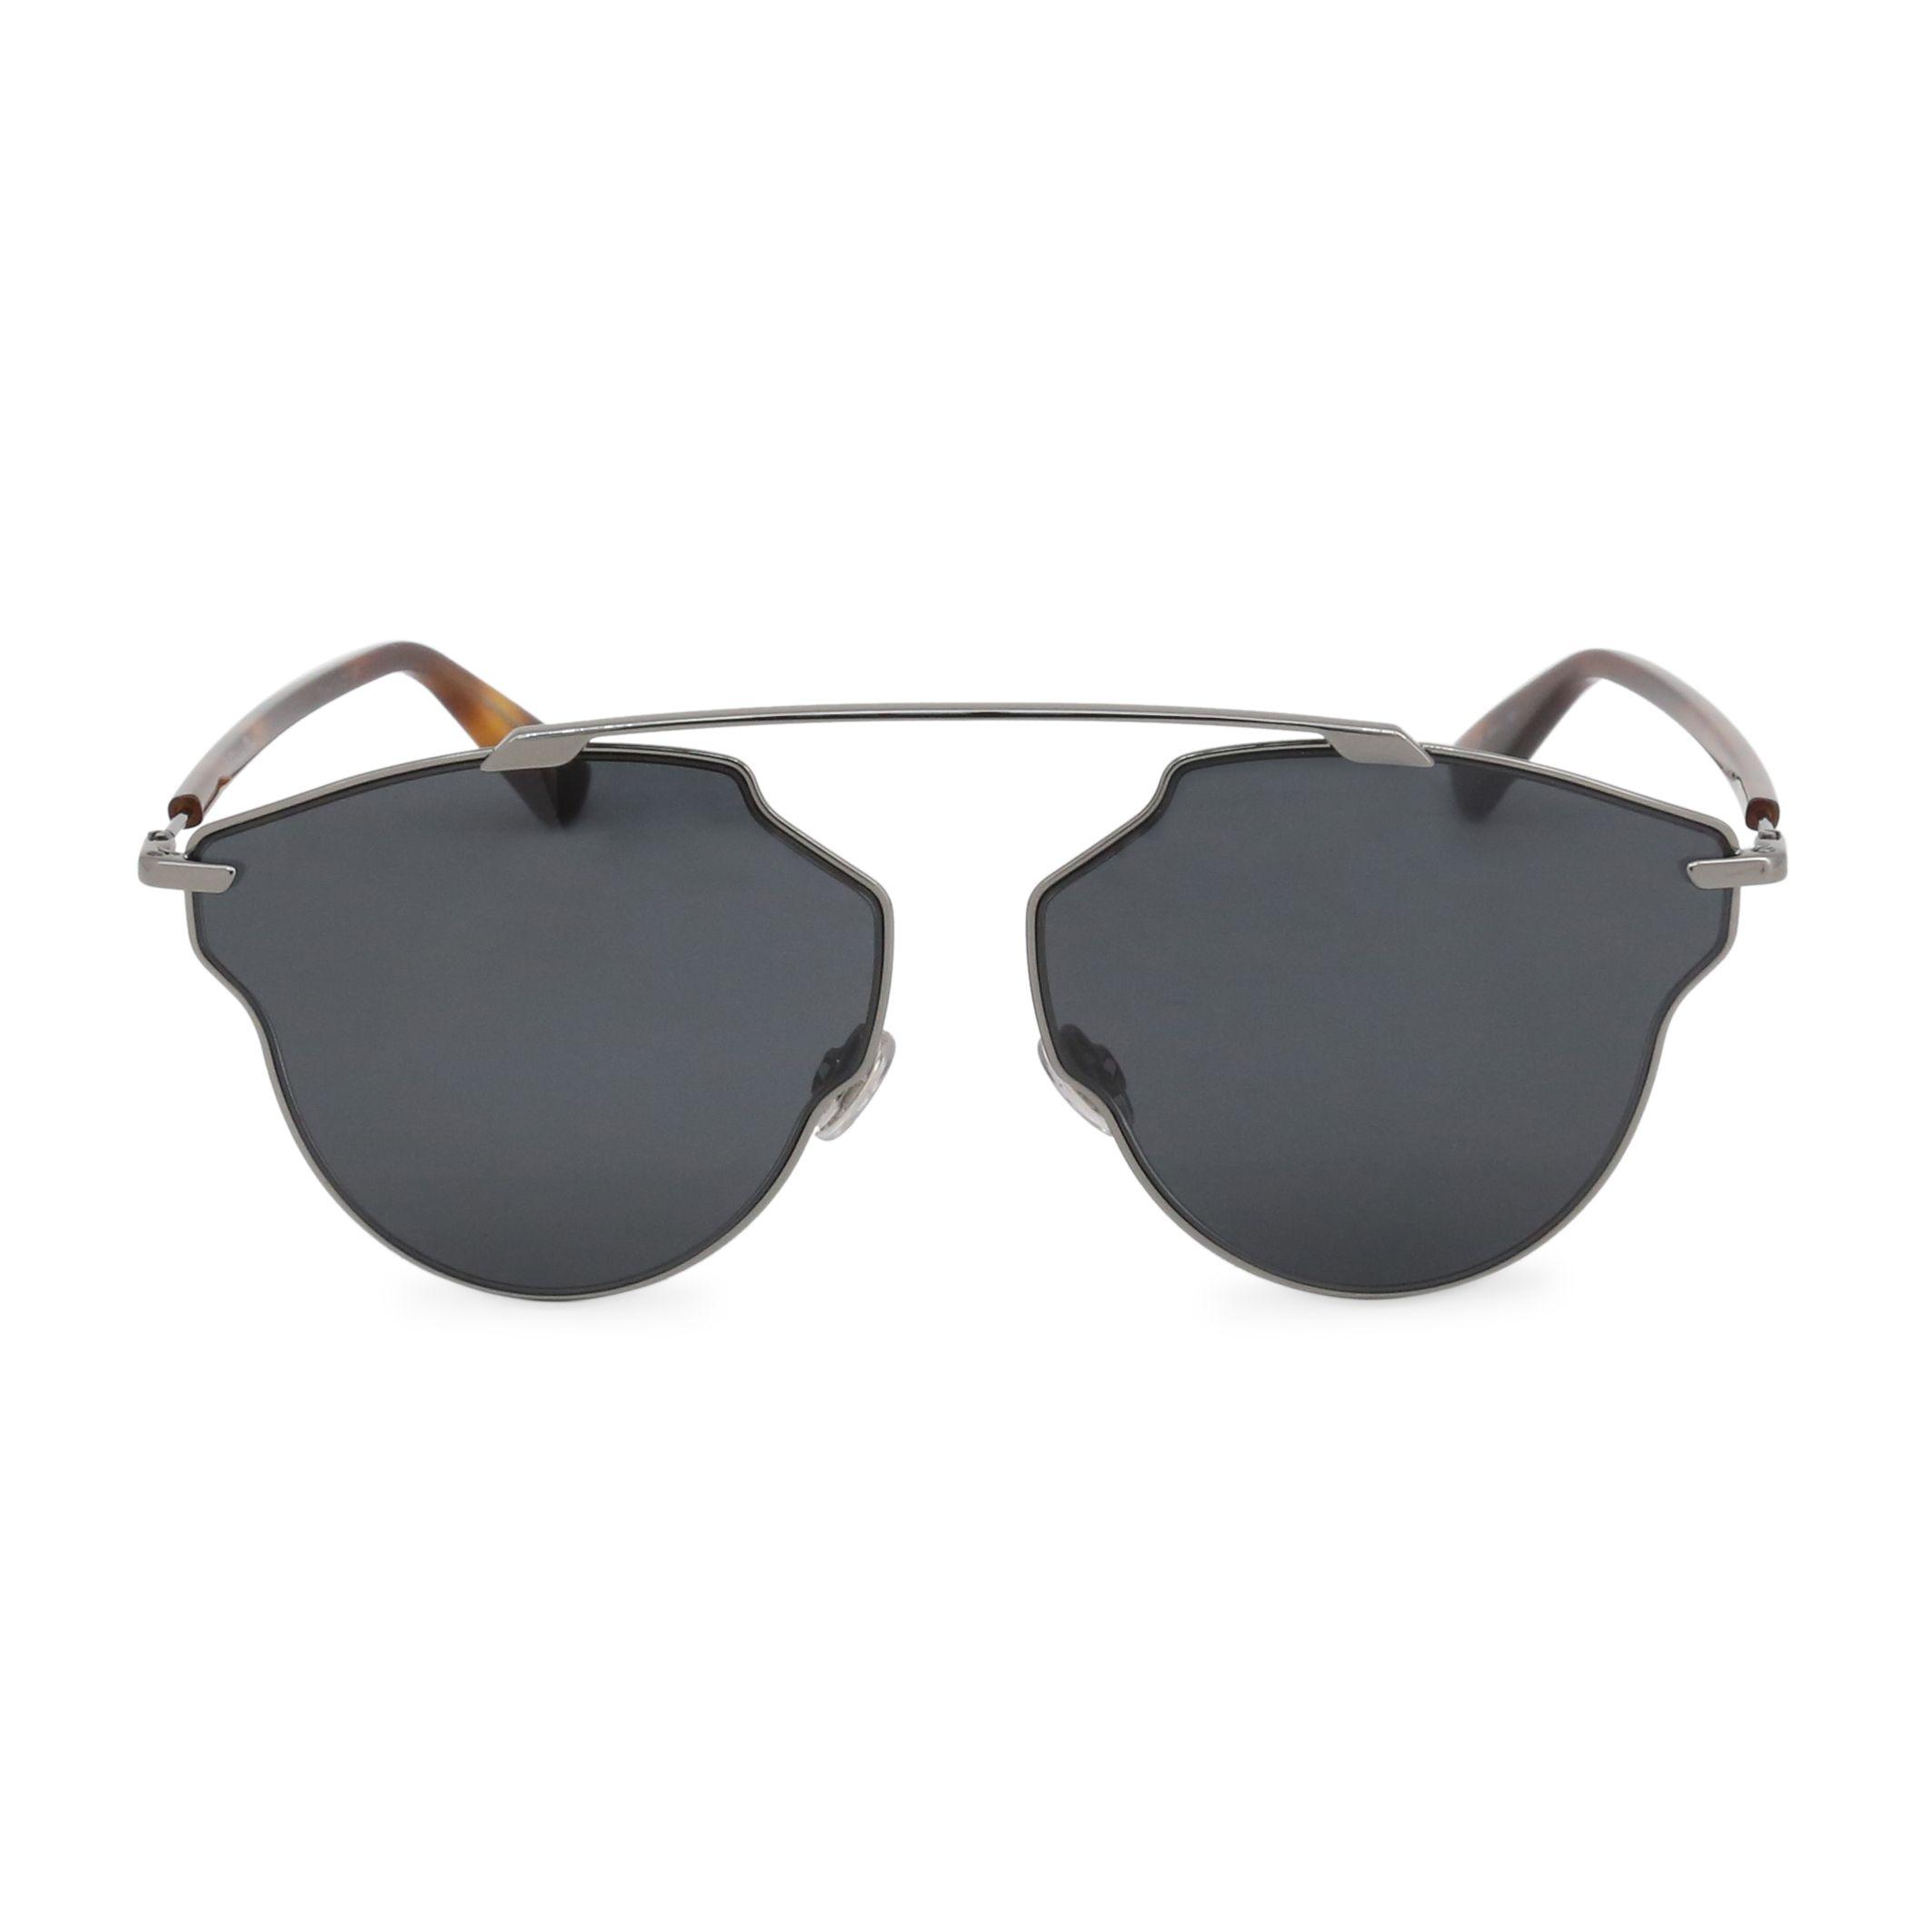 Accessoires Dior – DIORSOREALPOP – Grau